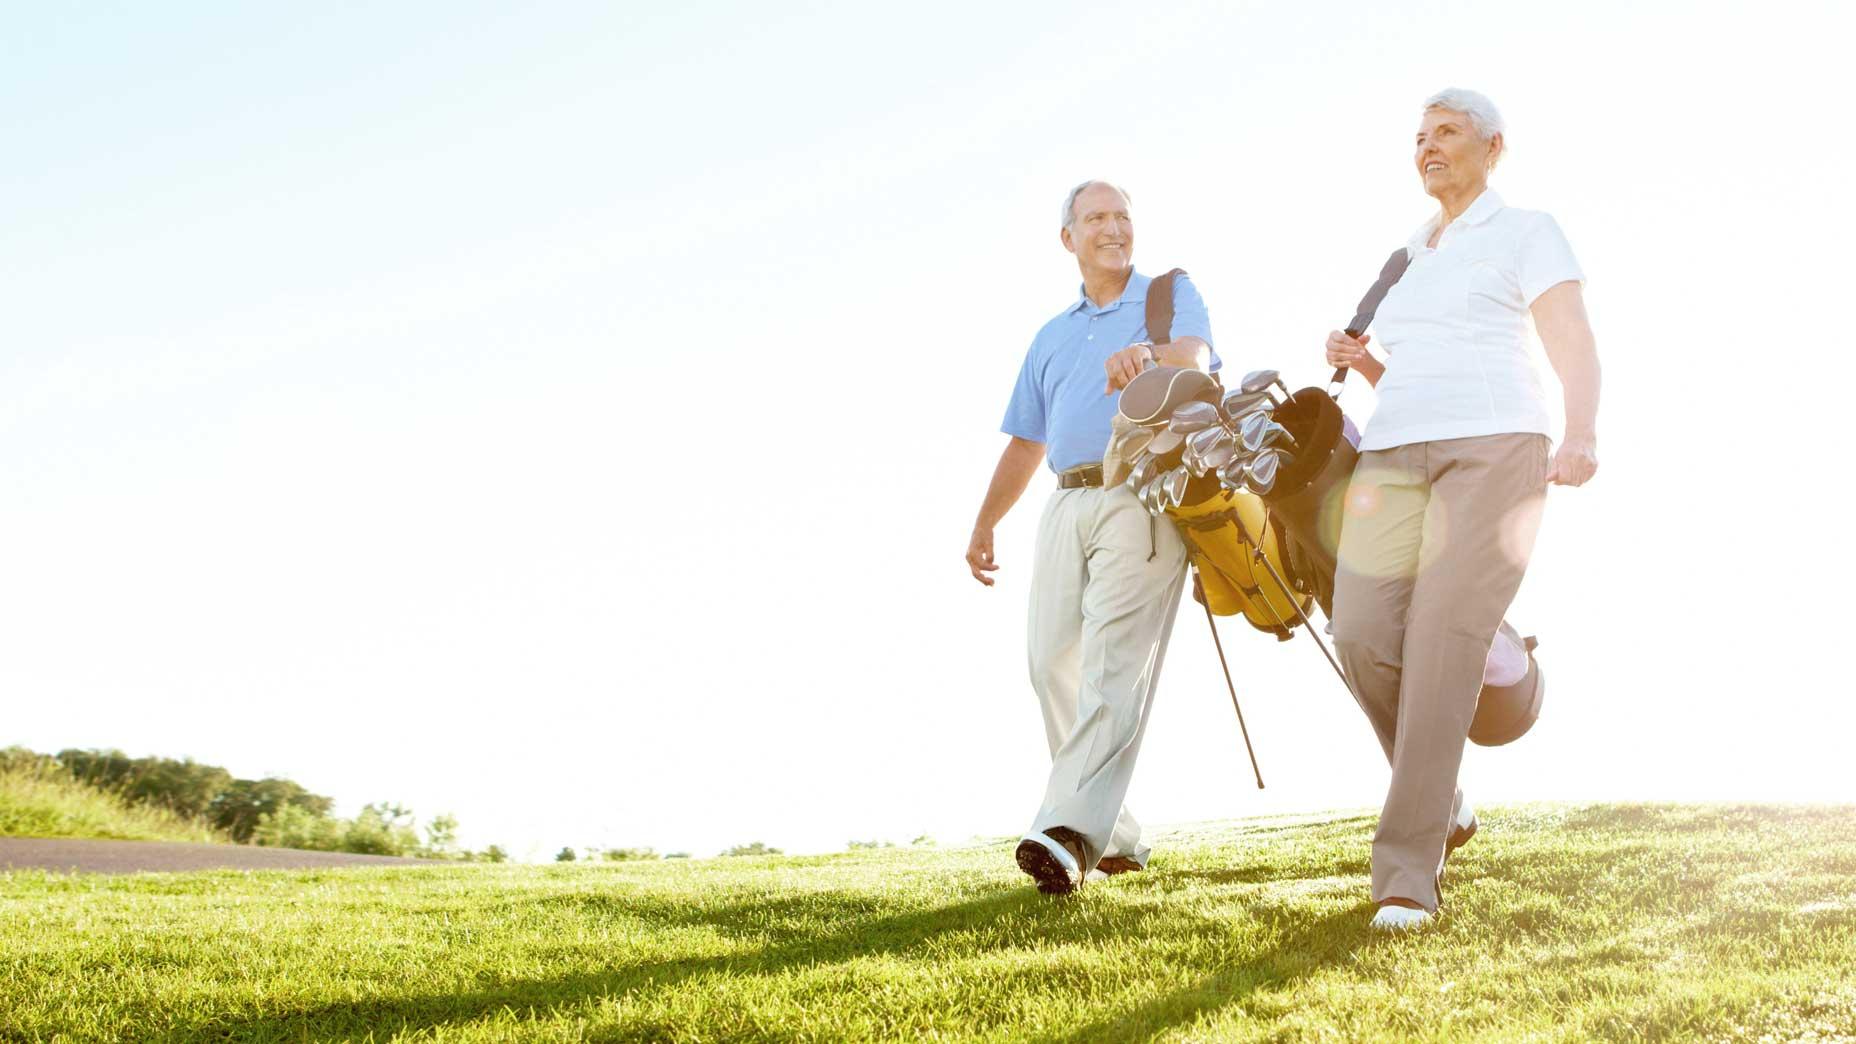 old golfers walk the fairway